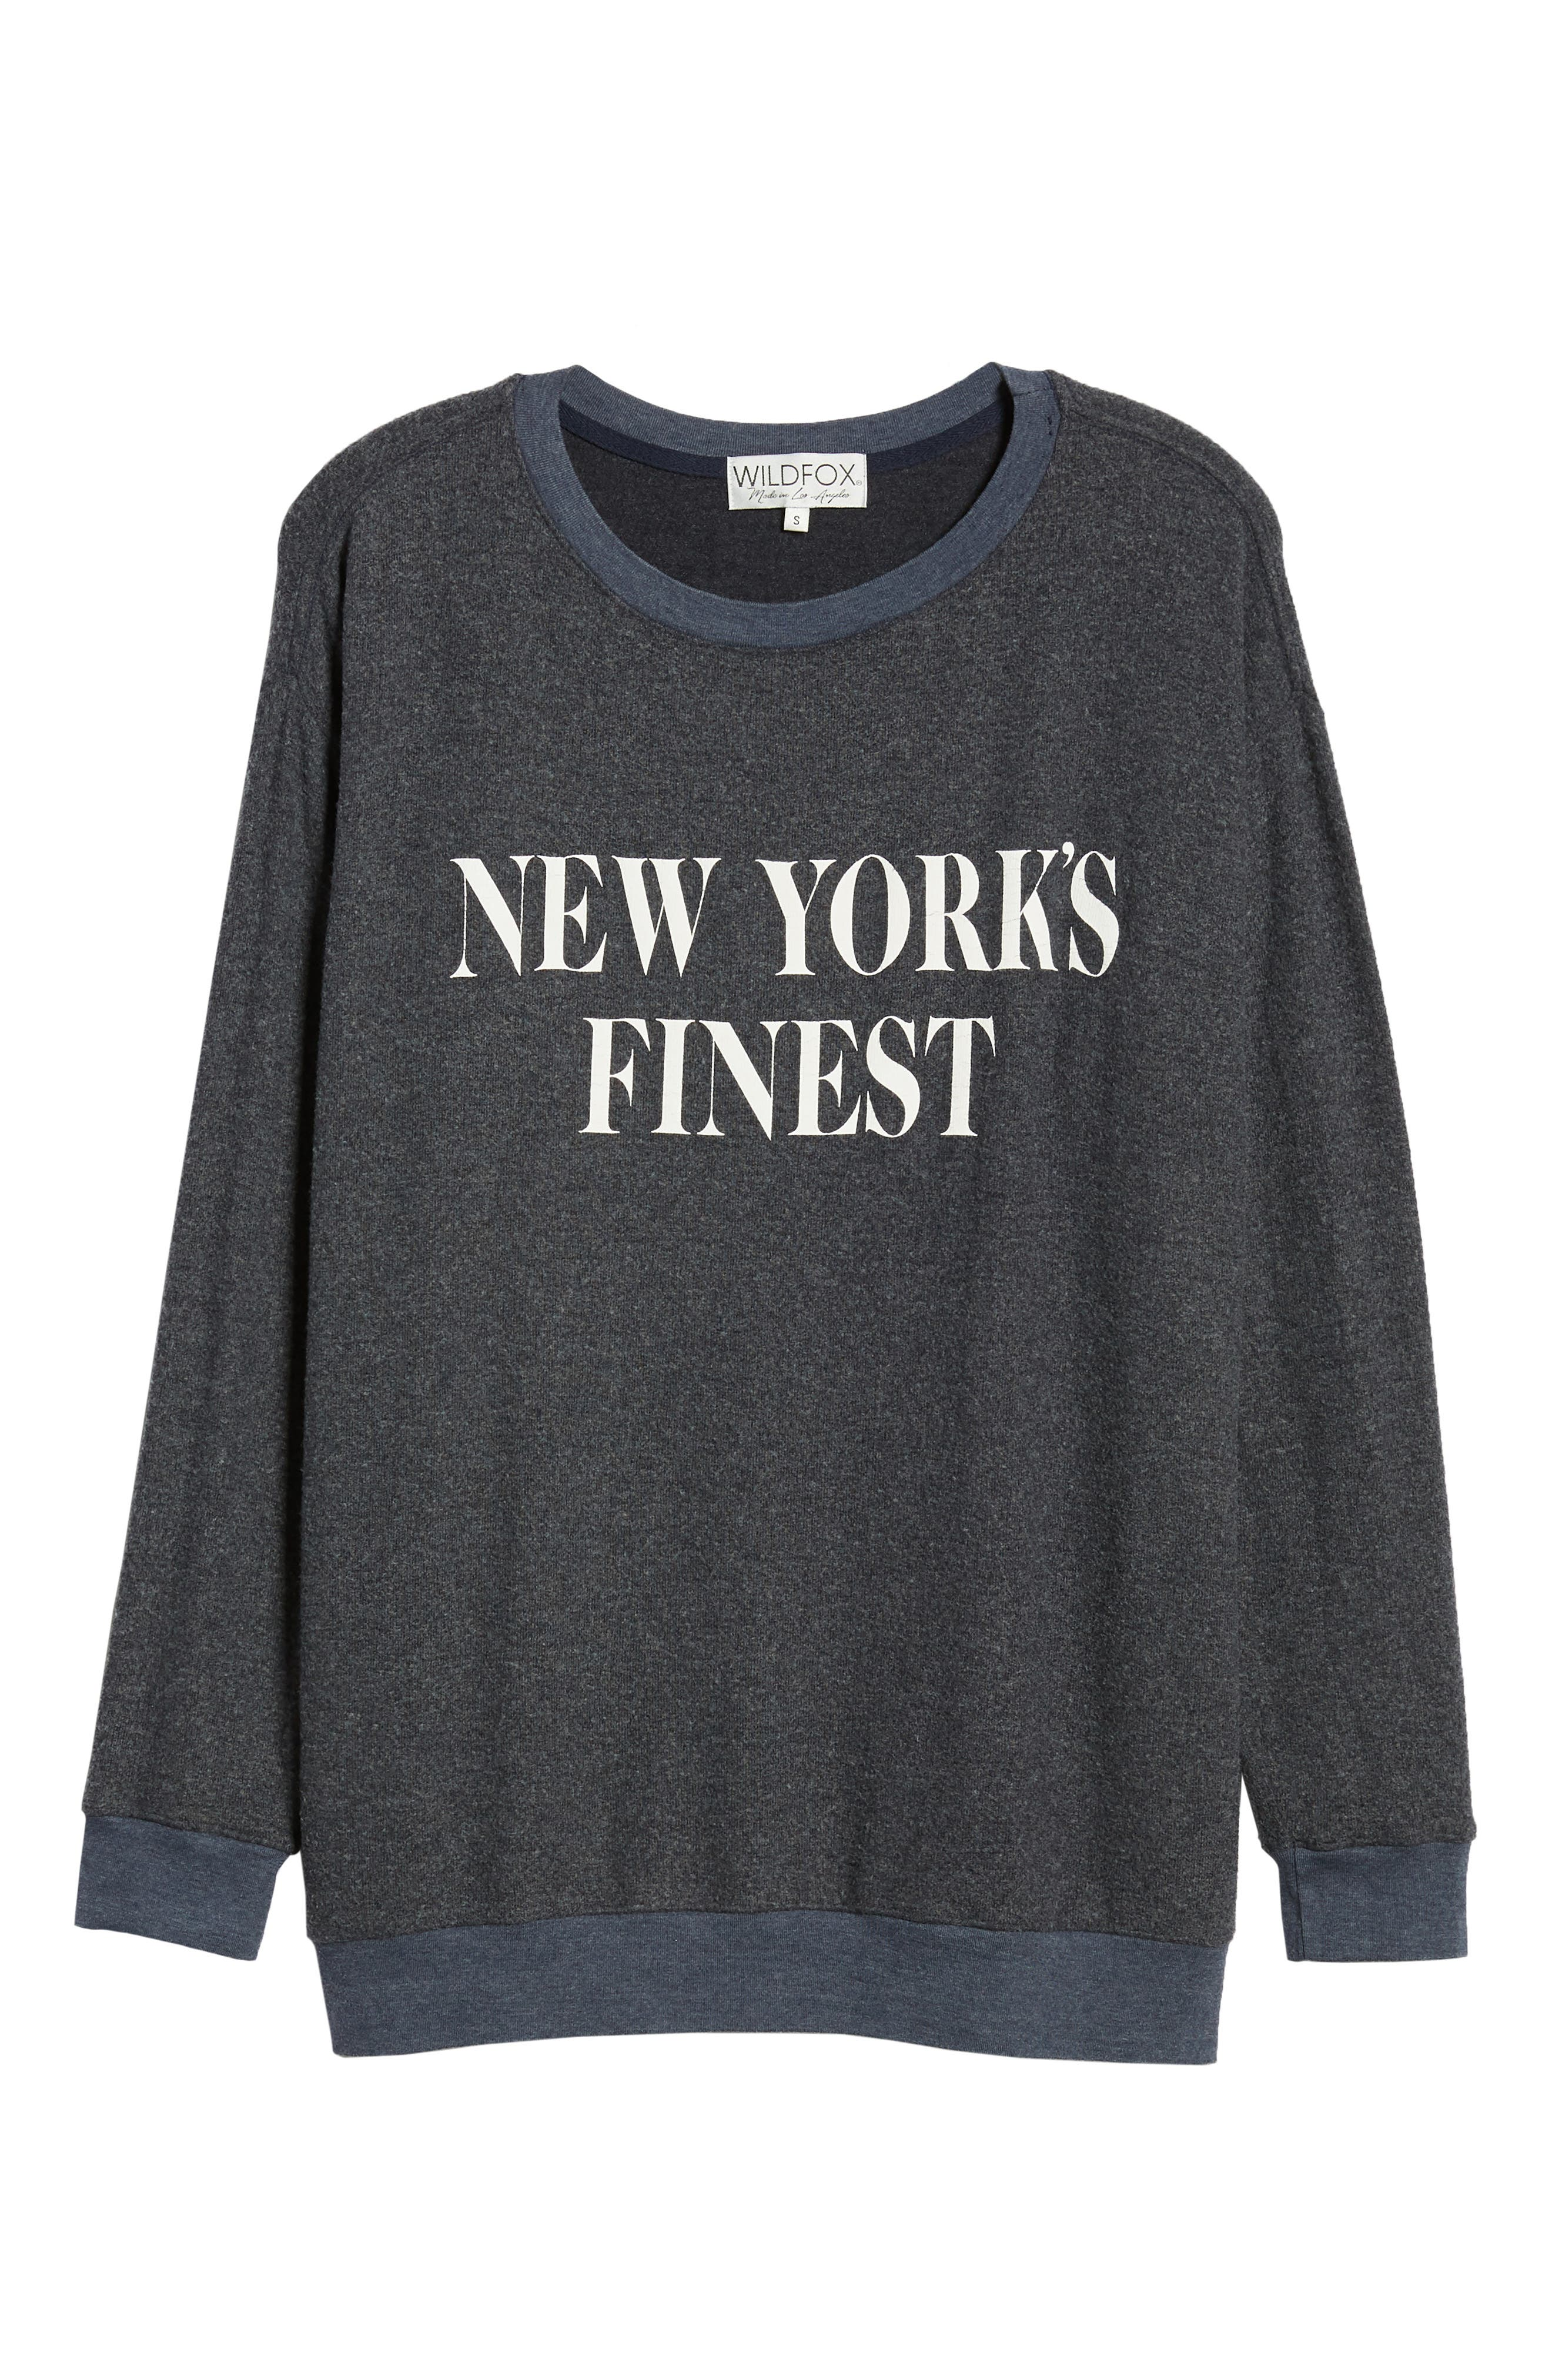 Roadtrip - New York's Finest Pullover,                             Alternate thumbnail 6, color,                             OXFORD